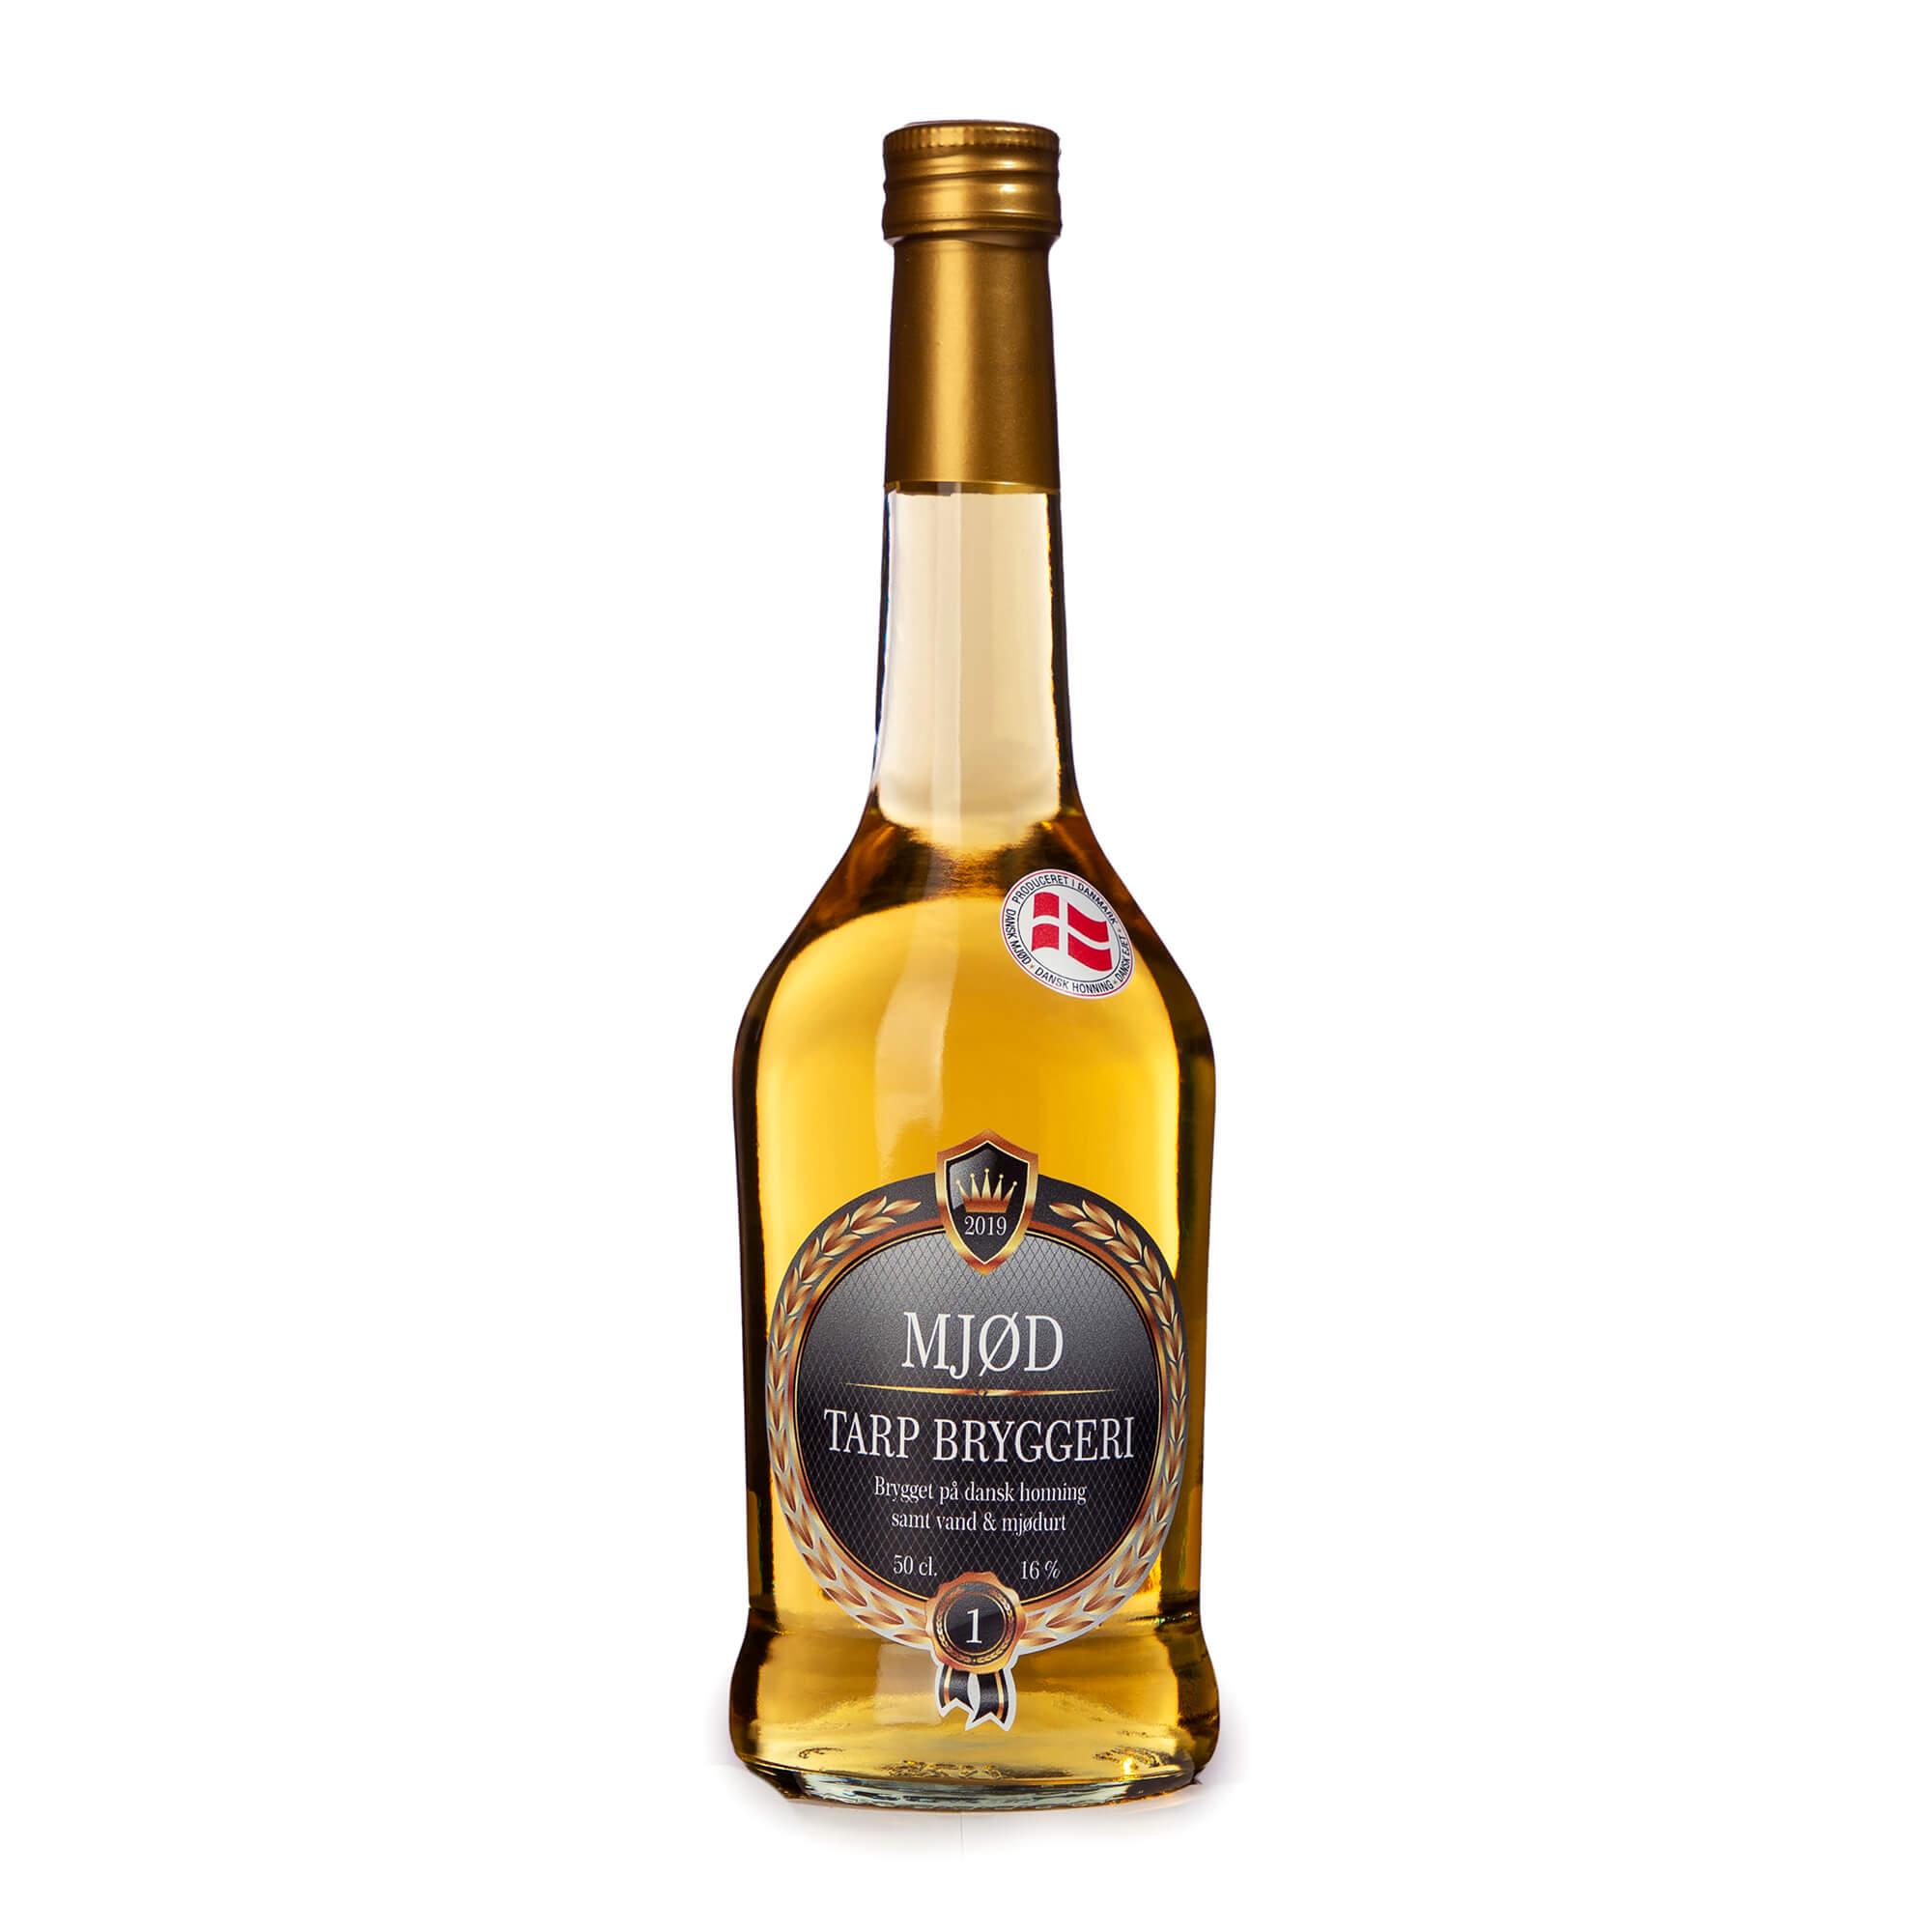 Klassisk Mjød - Tarp Bryggeri